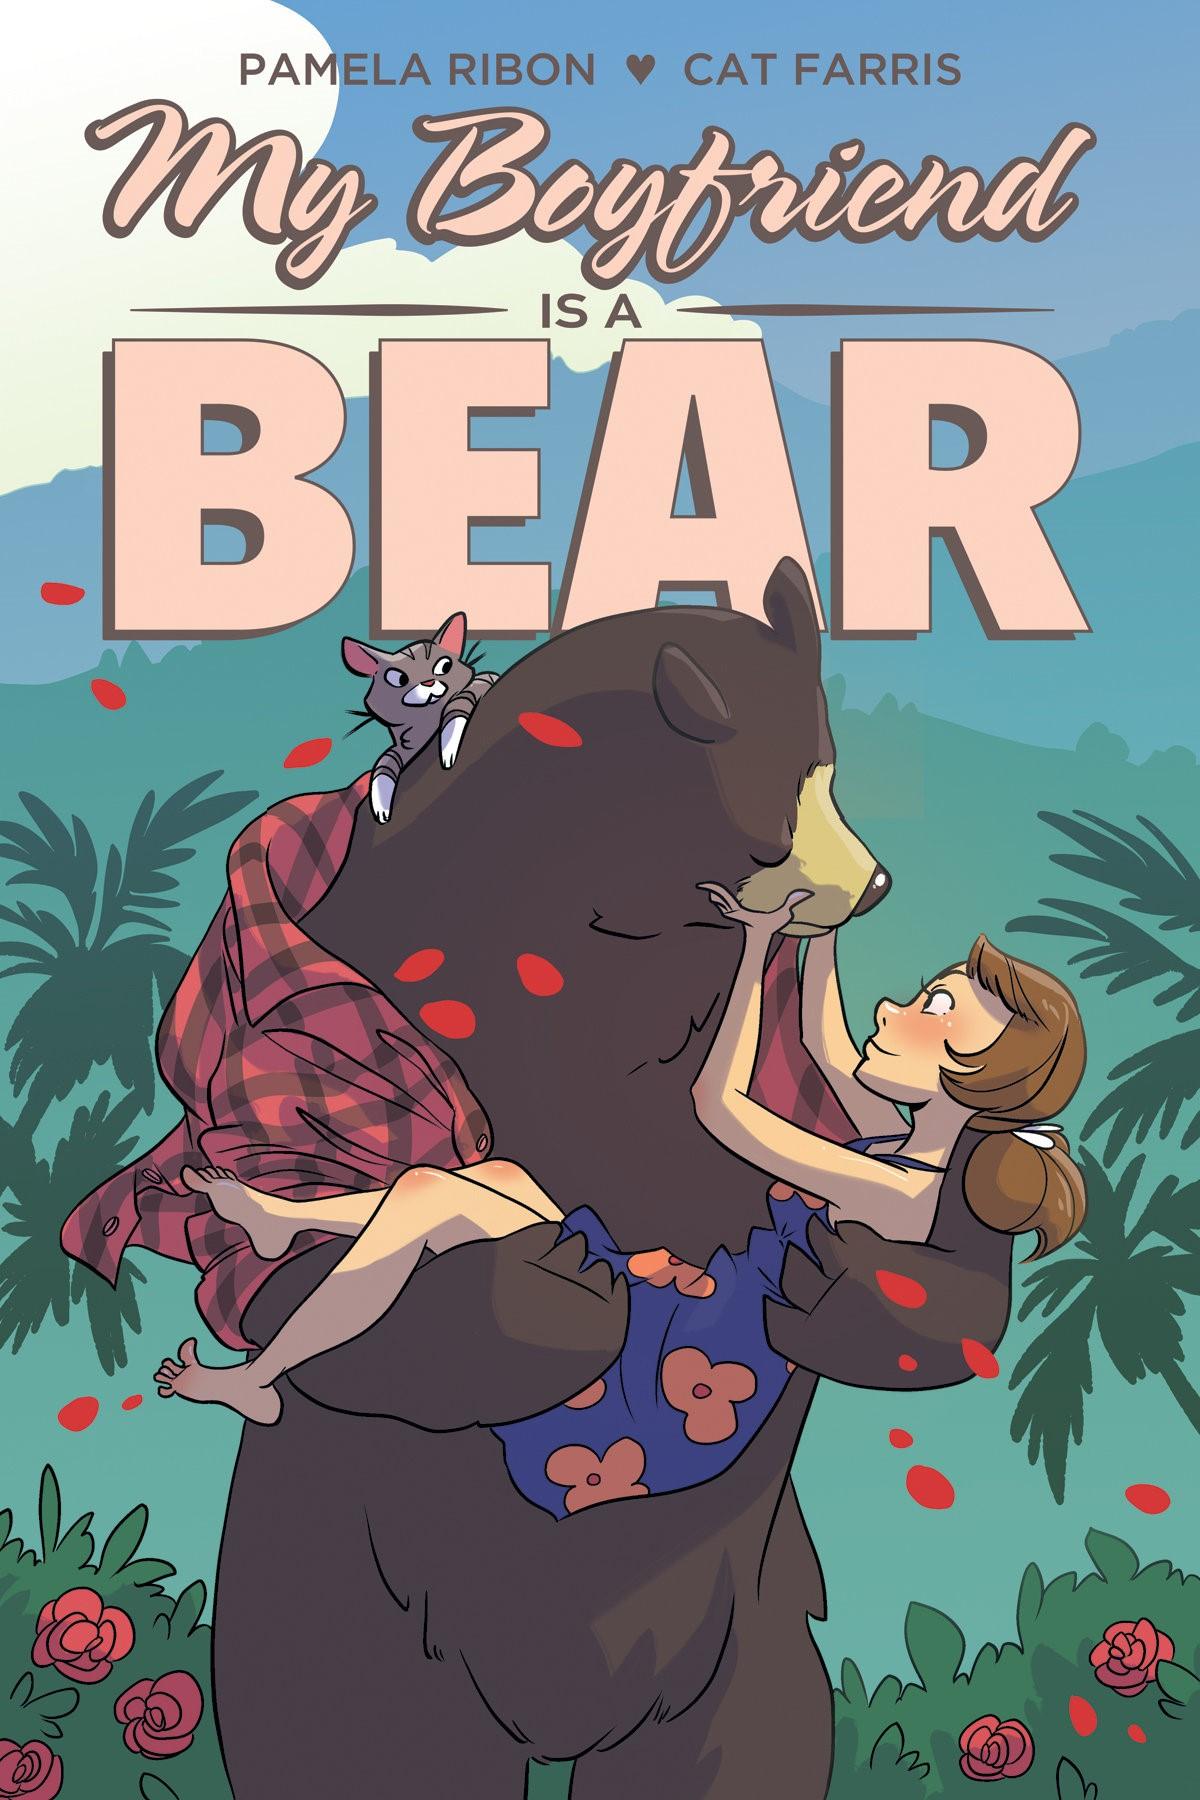 My Boyfriend is a Bear  by Pamela Ribon and Cat Farris